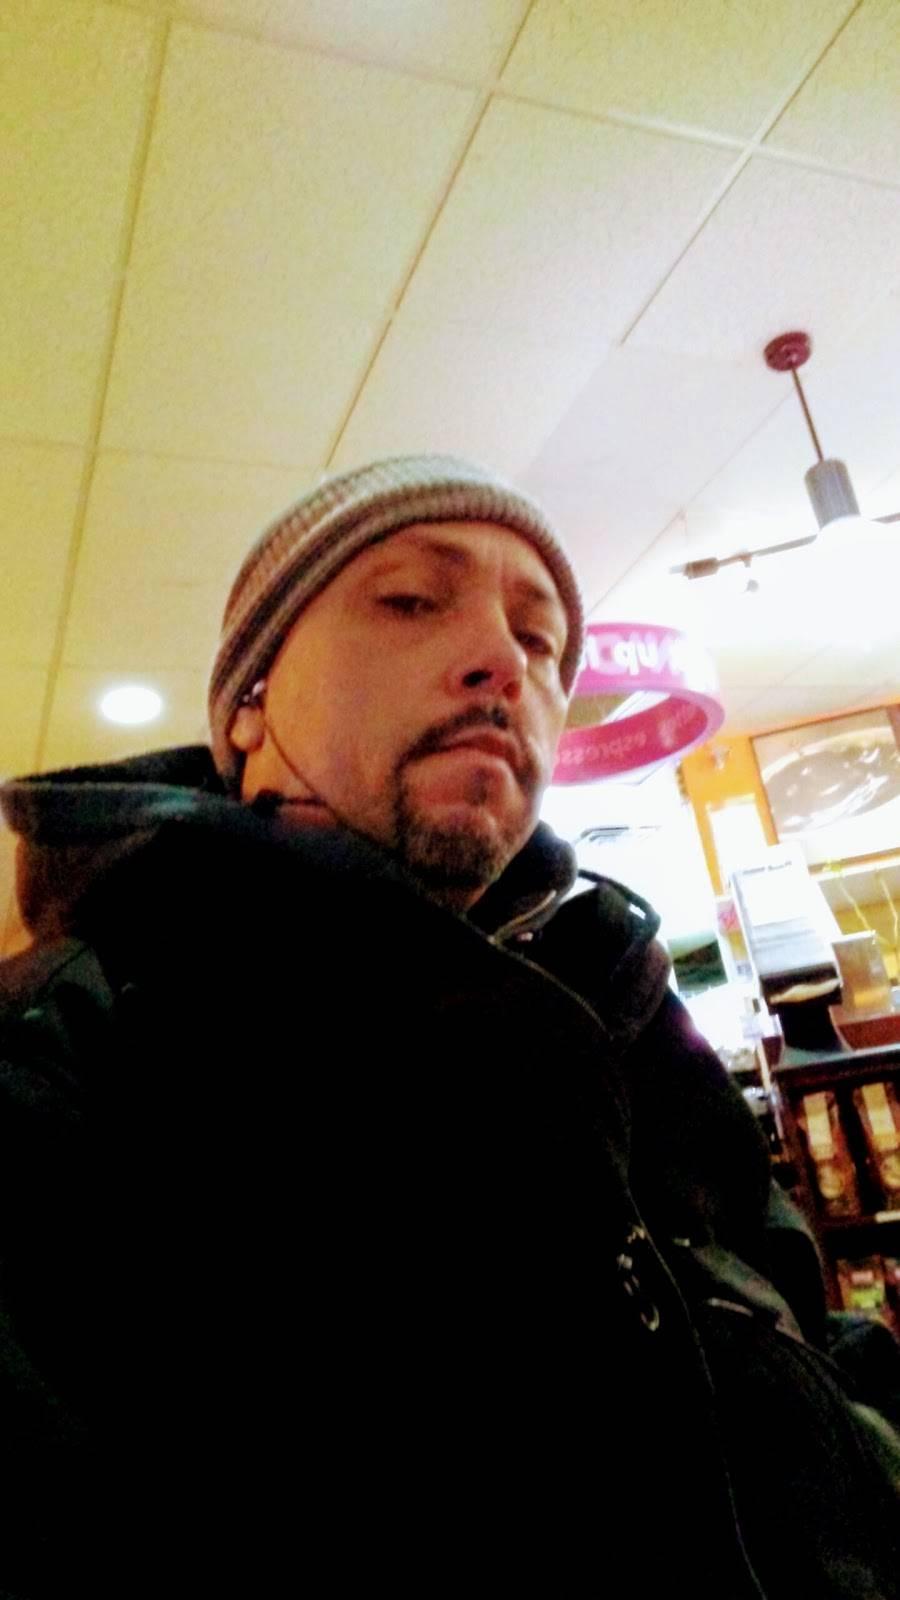 Dunkin | cafe | 213 W 4th St, Bethlehem, PA 18015, USA | 6108659400 OR +1 610-865-9400